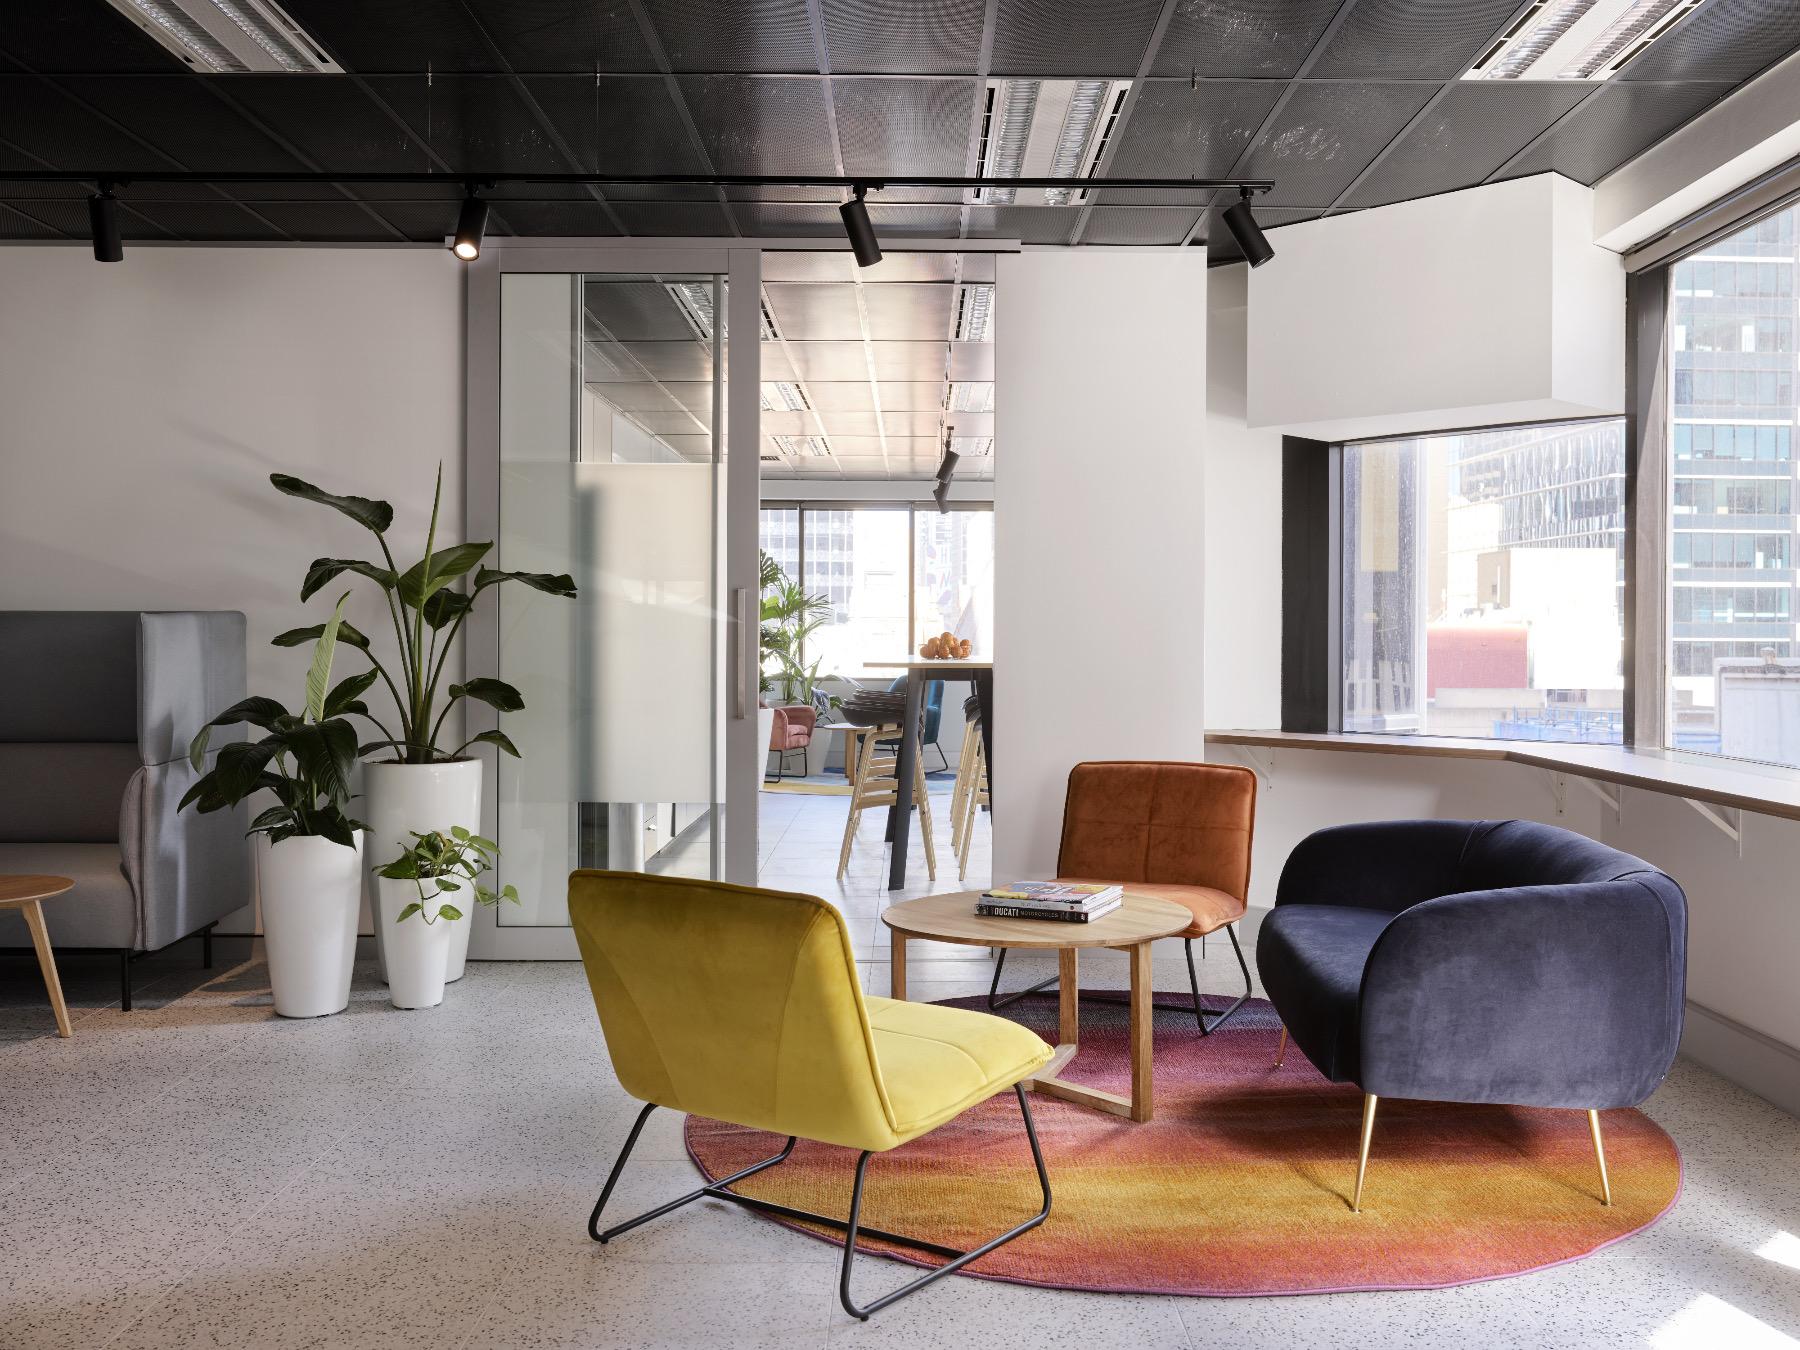 A Look Inside Infosys' New Sydney Office